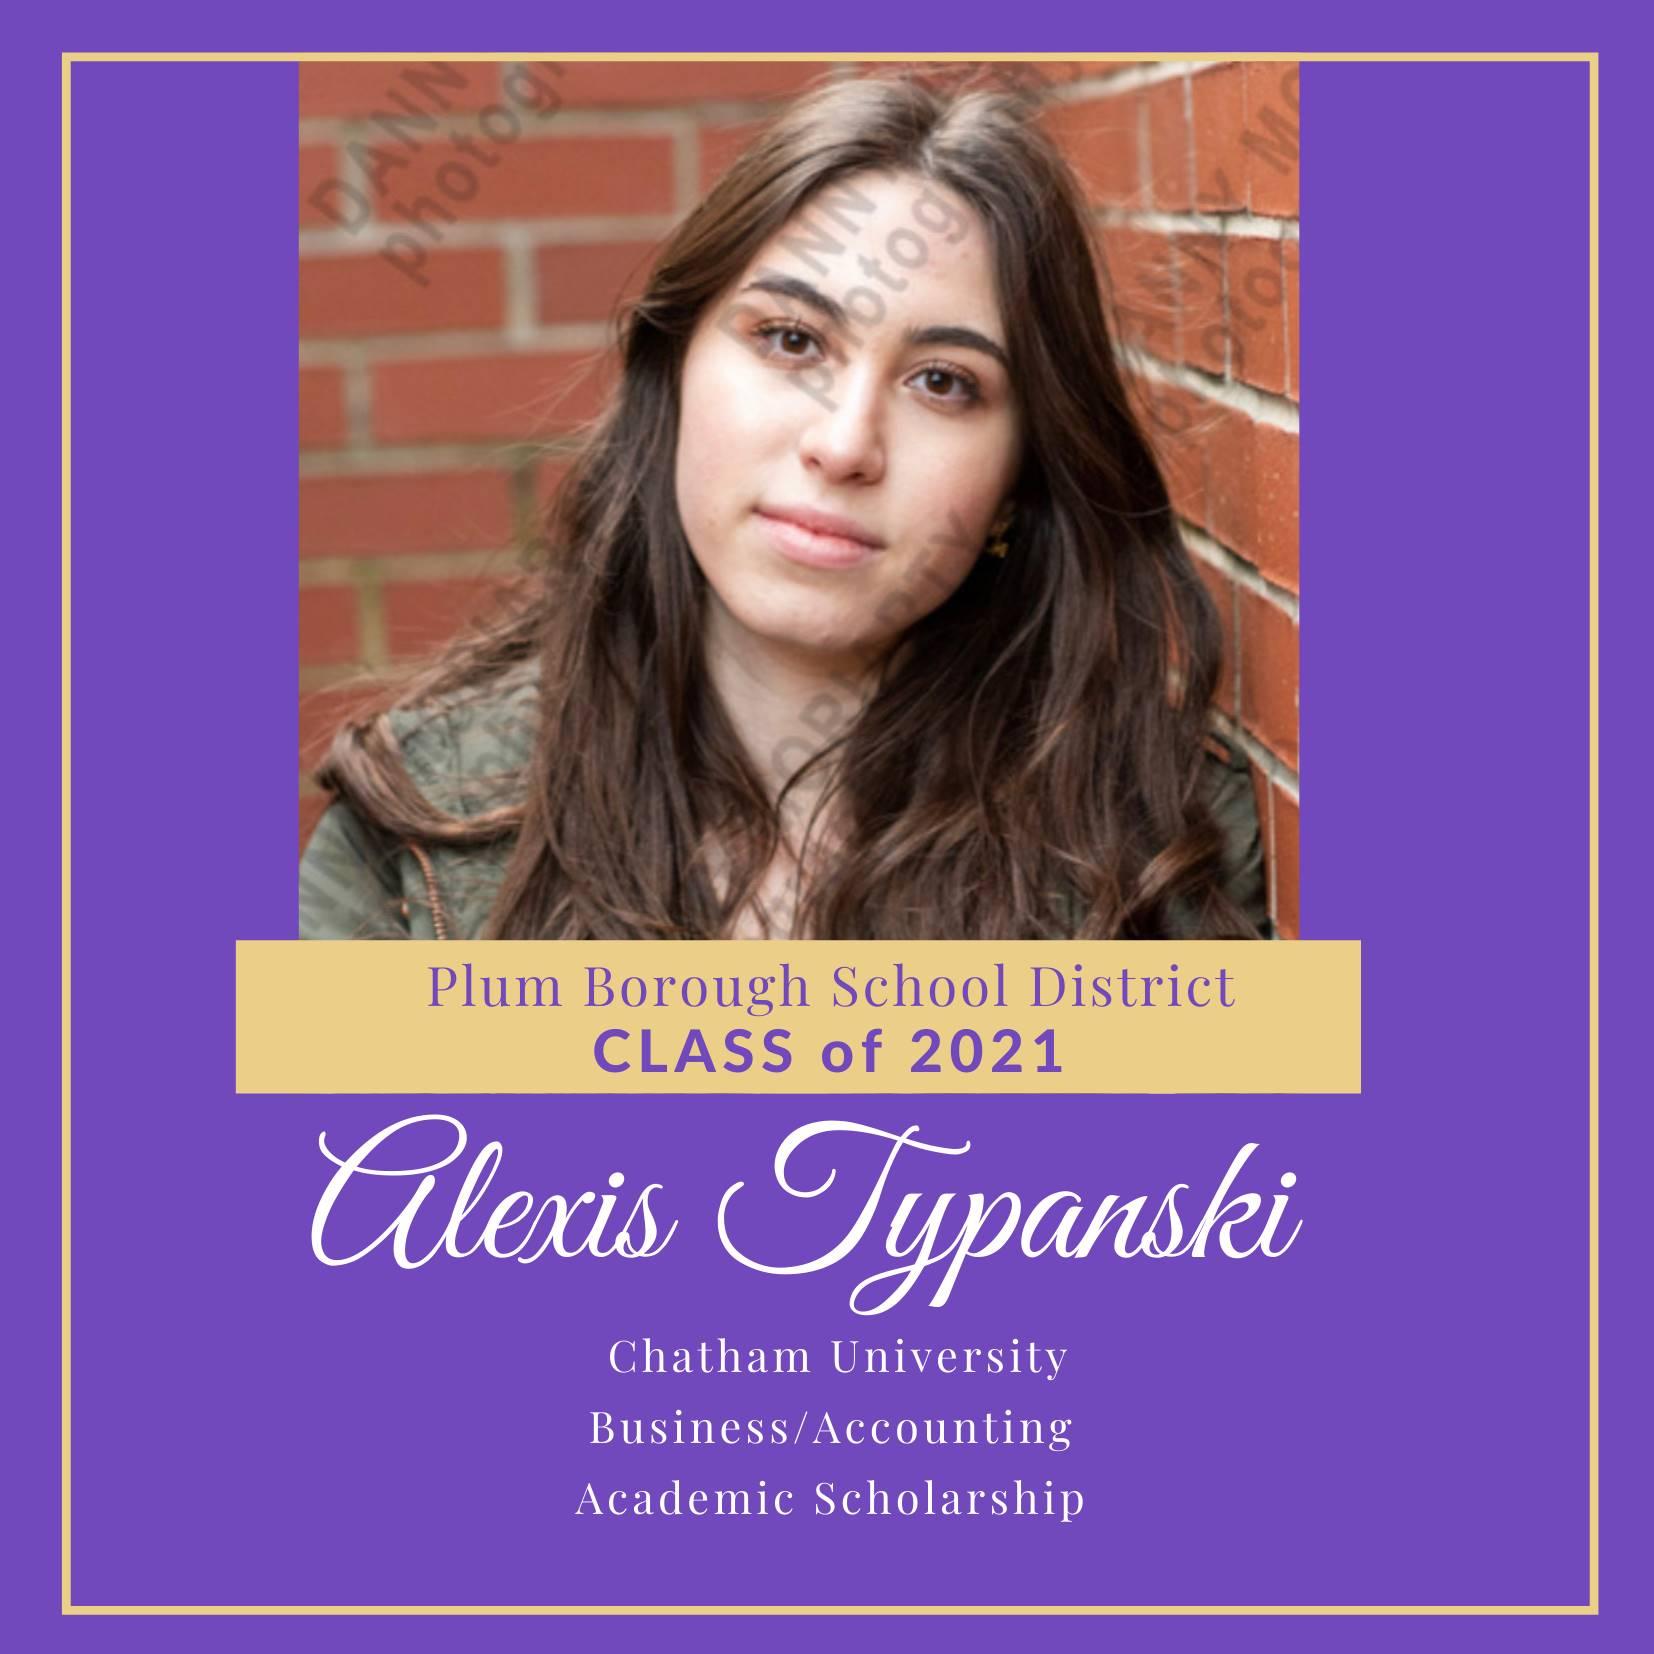 Congratulations to Alexis Typanski, Class of 2021!